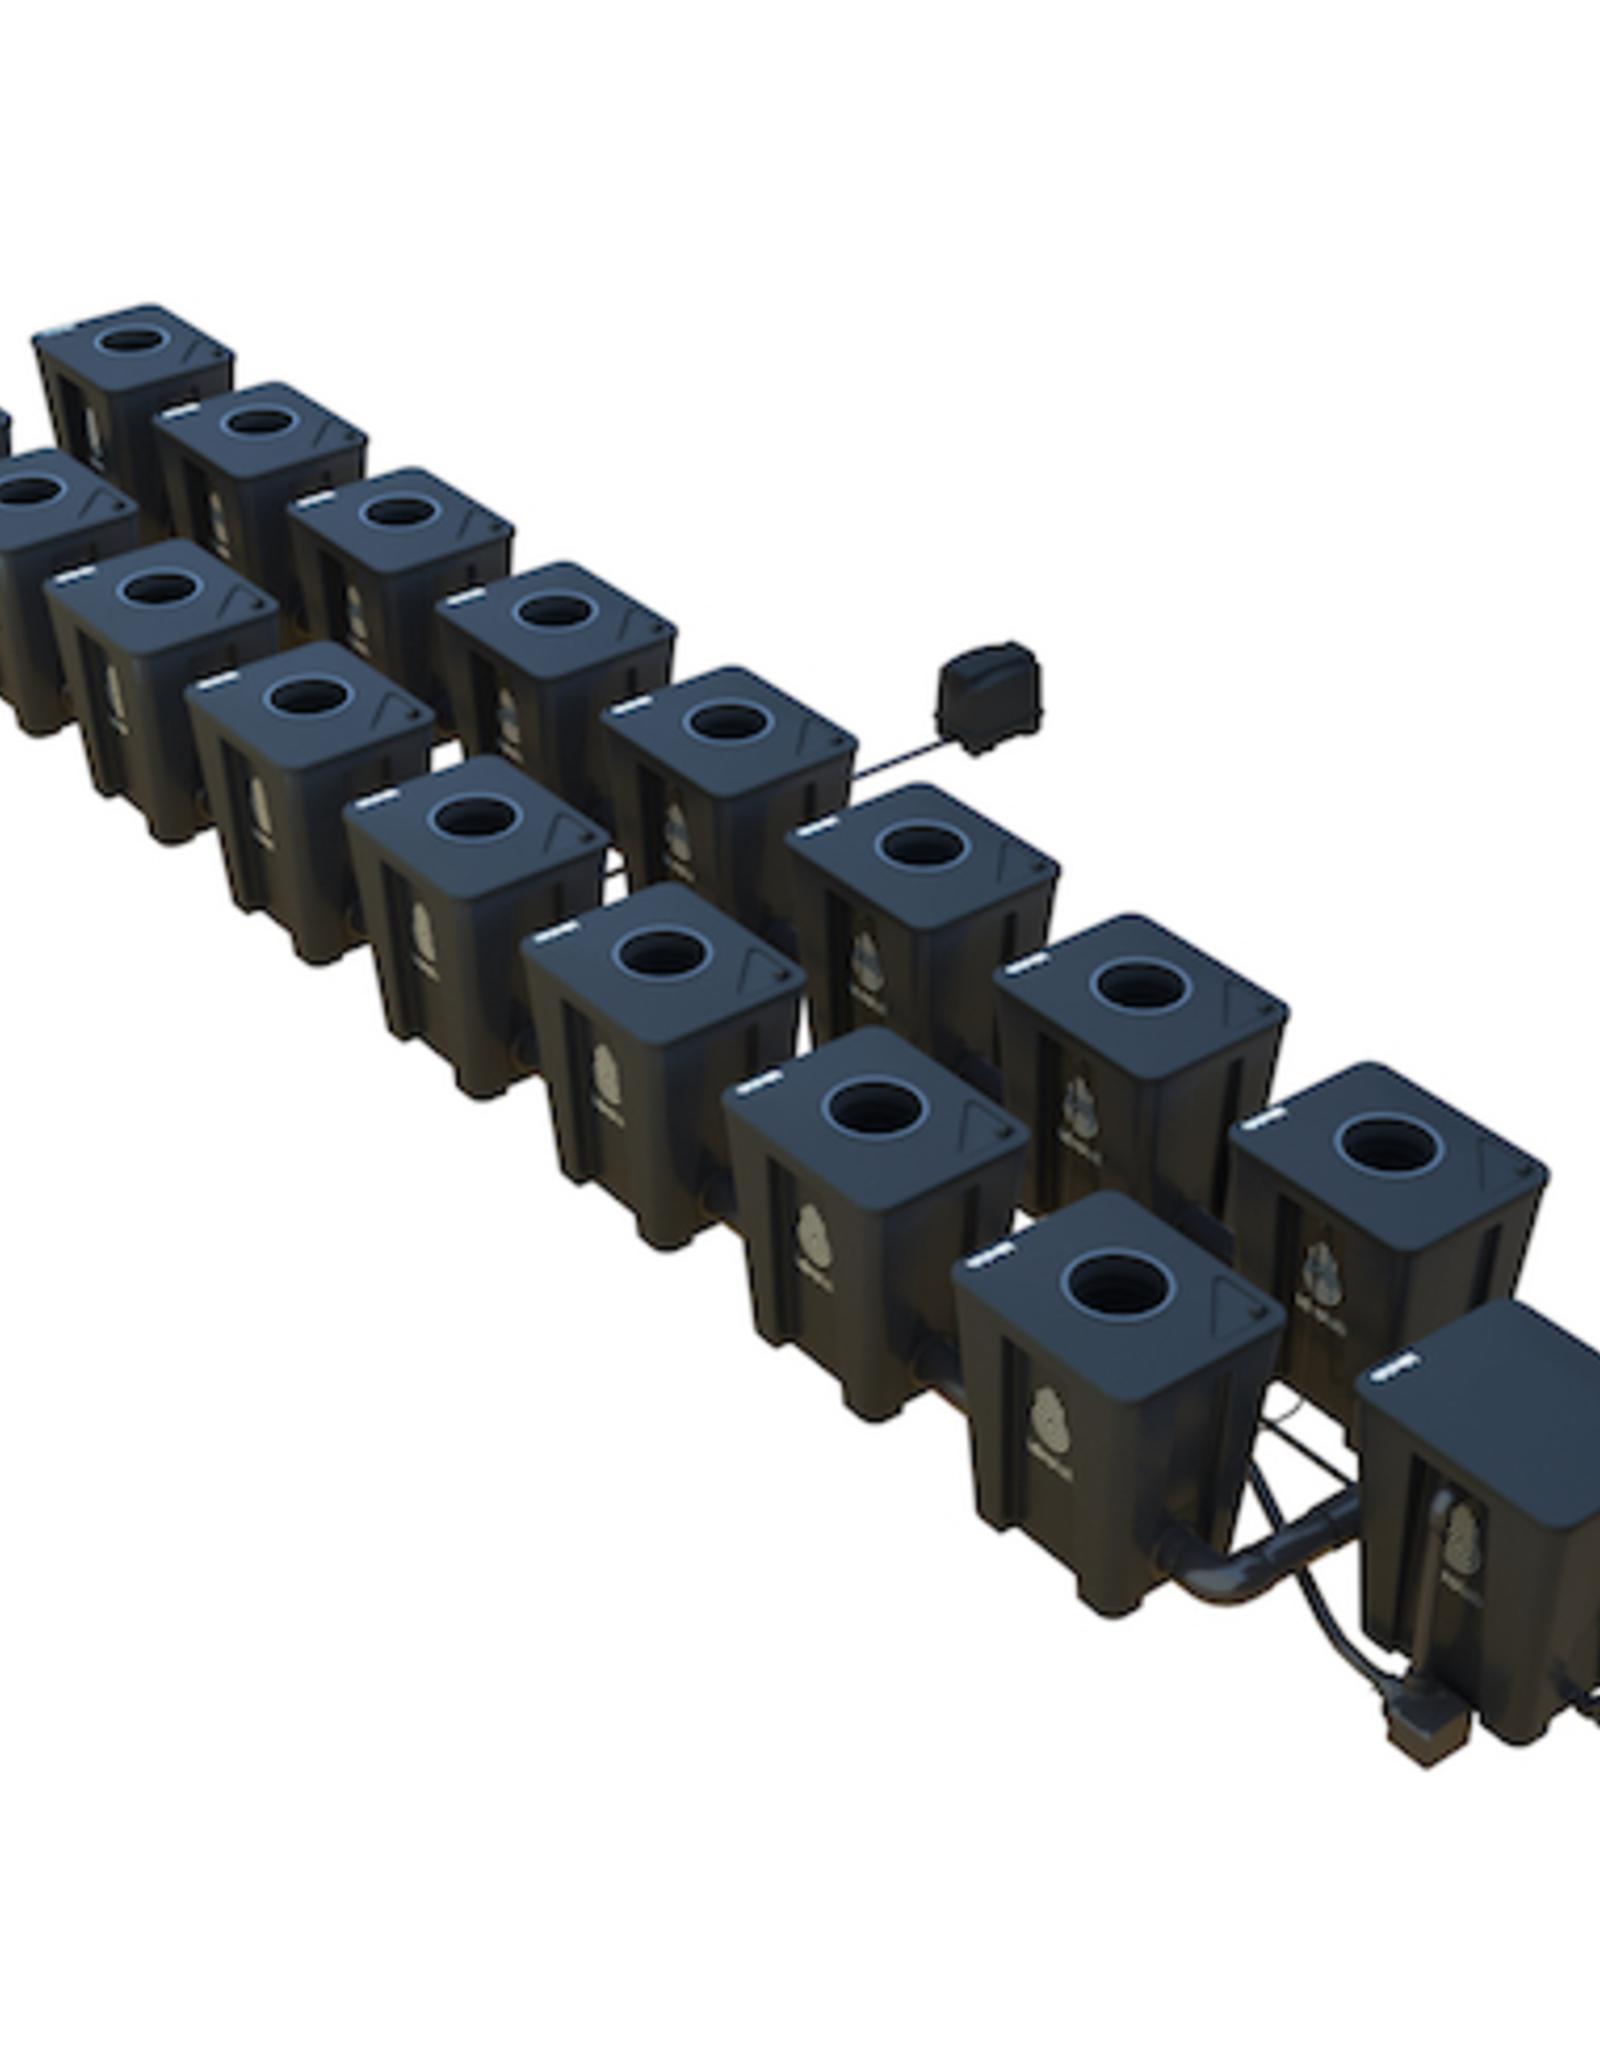 IDROLAB IDROLAB RDWC SYSTEM 2 ORIGINAL 16+1